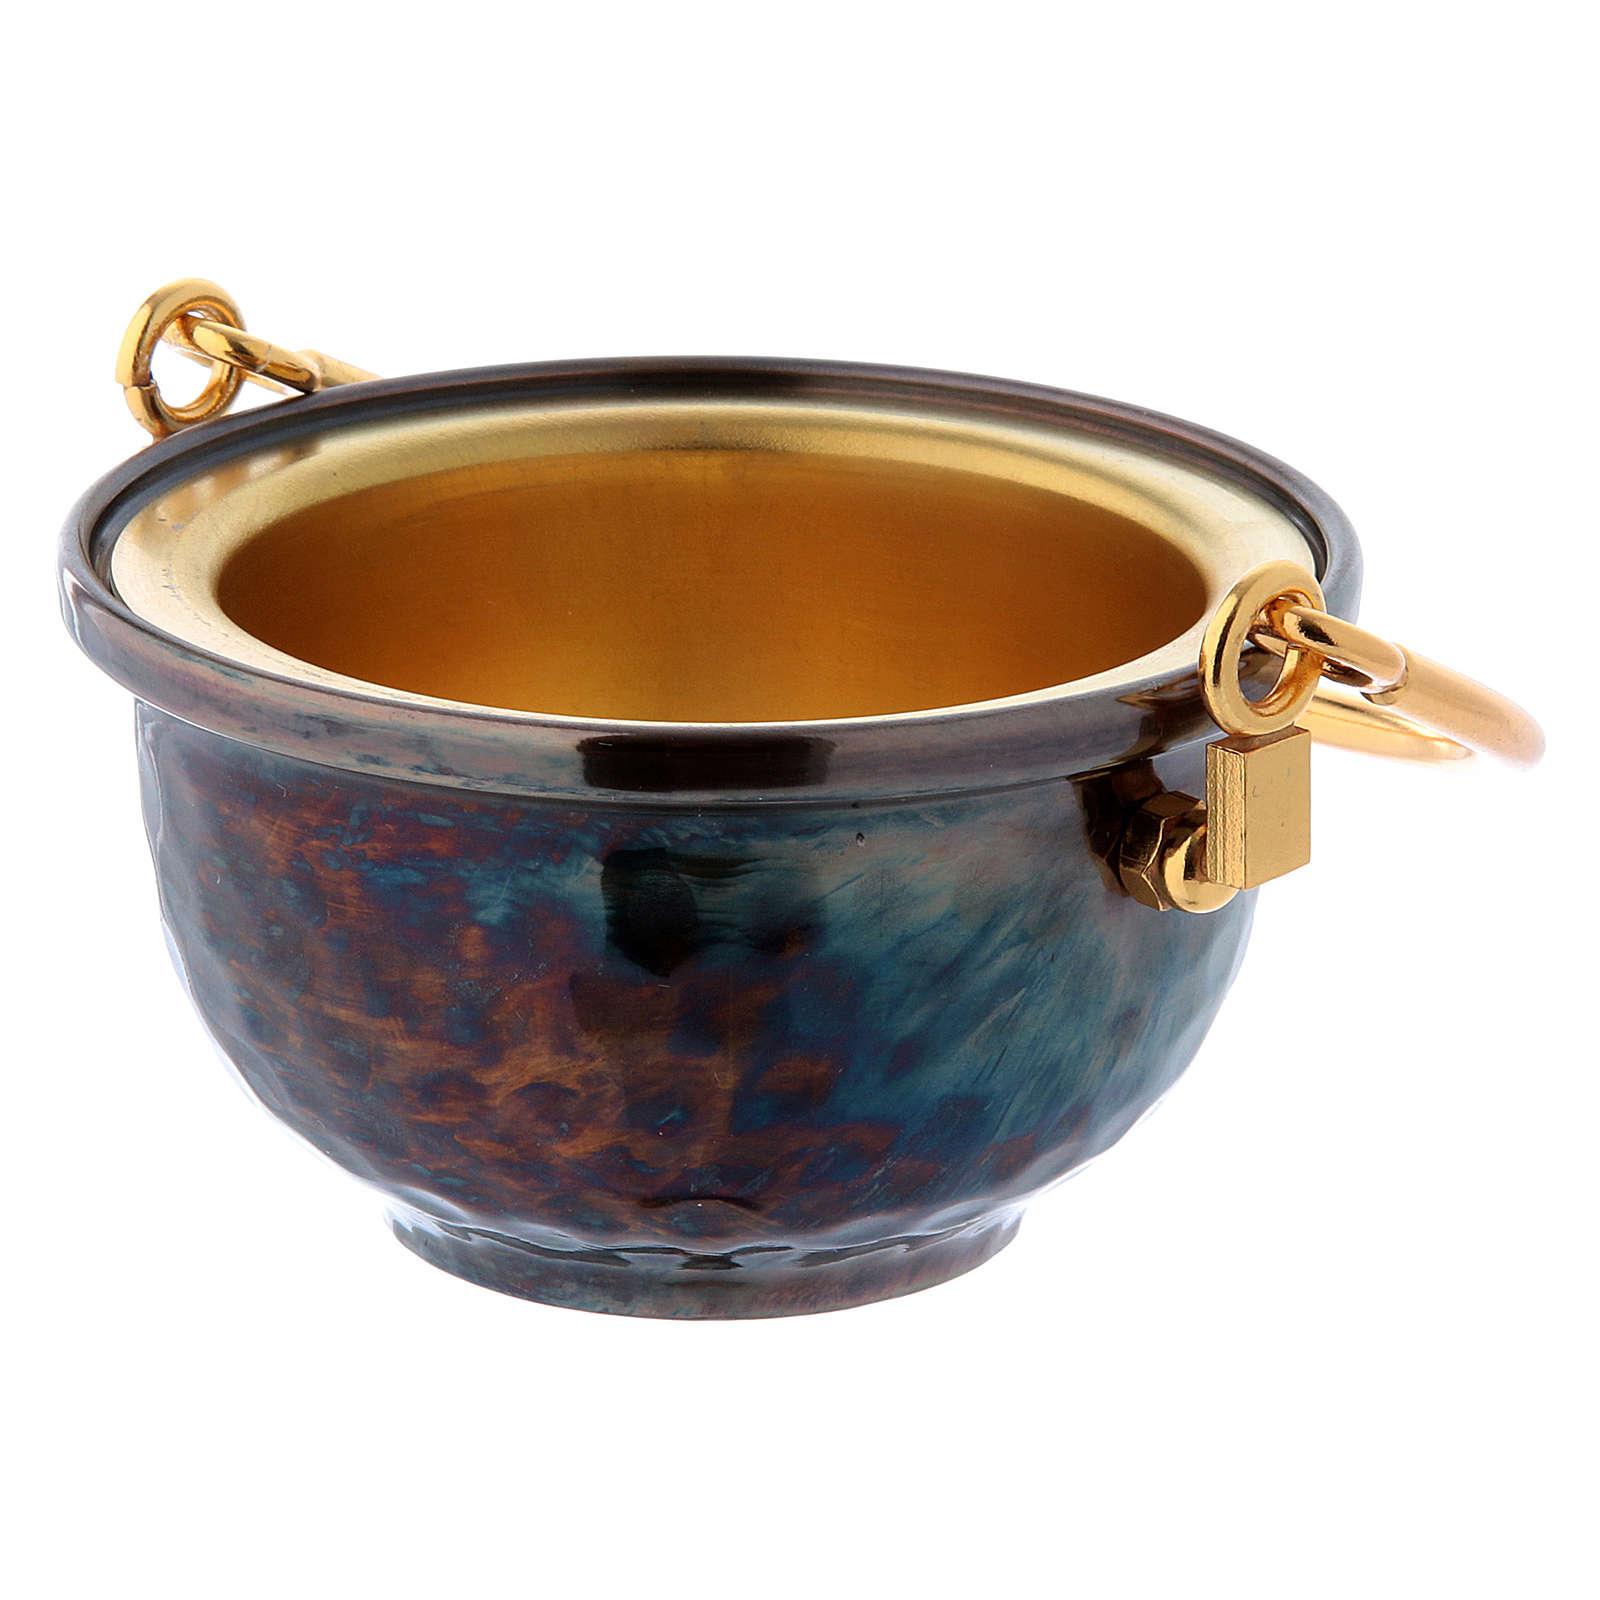 Seau à eau bénite, bronze 3